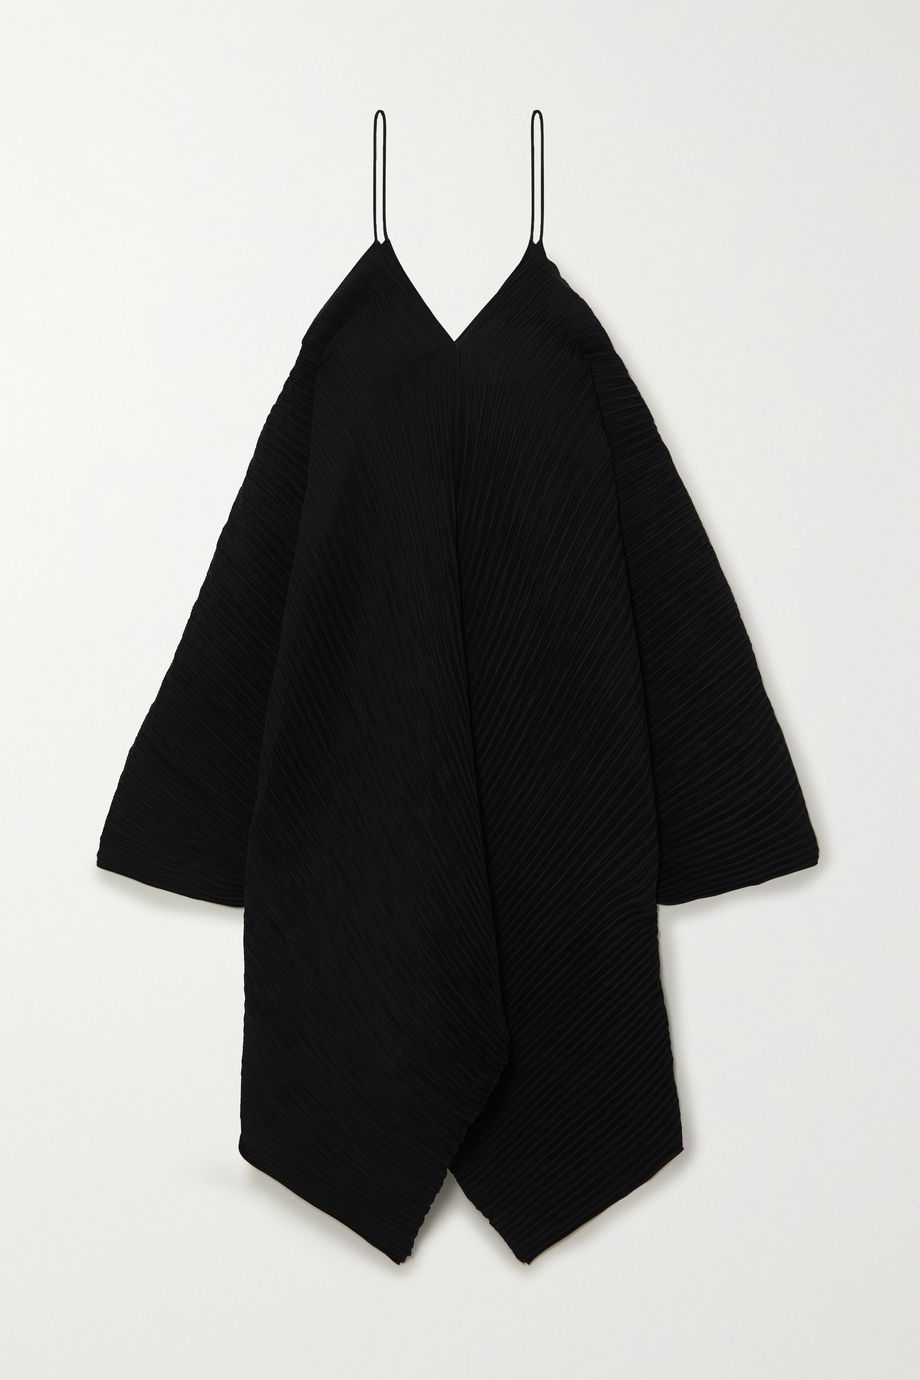 Loewe Asymmetric plissé crepe de chine dress